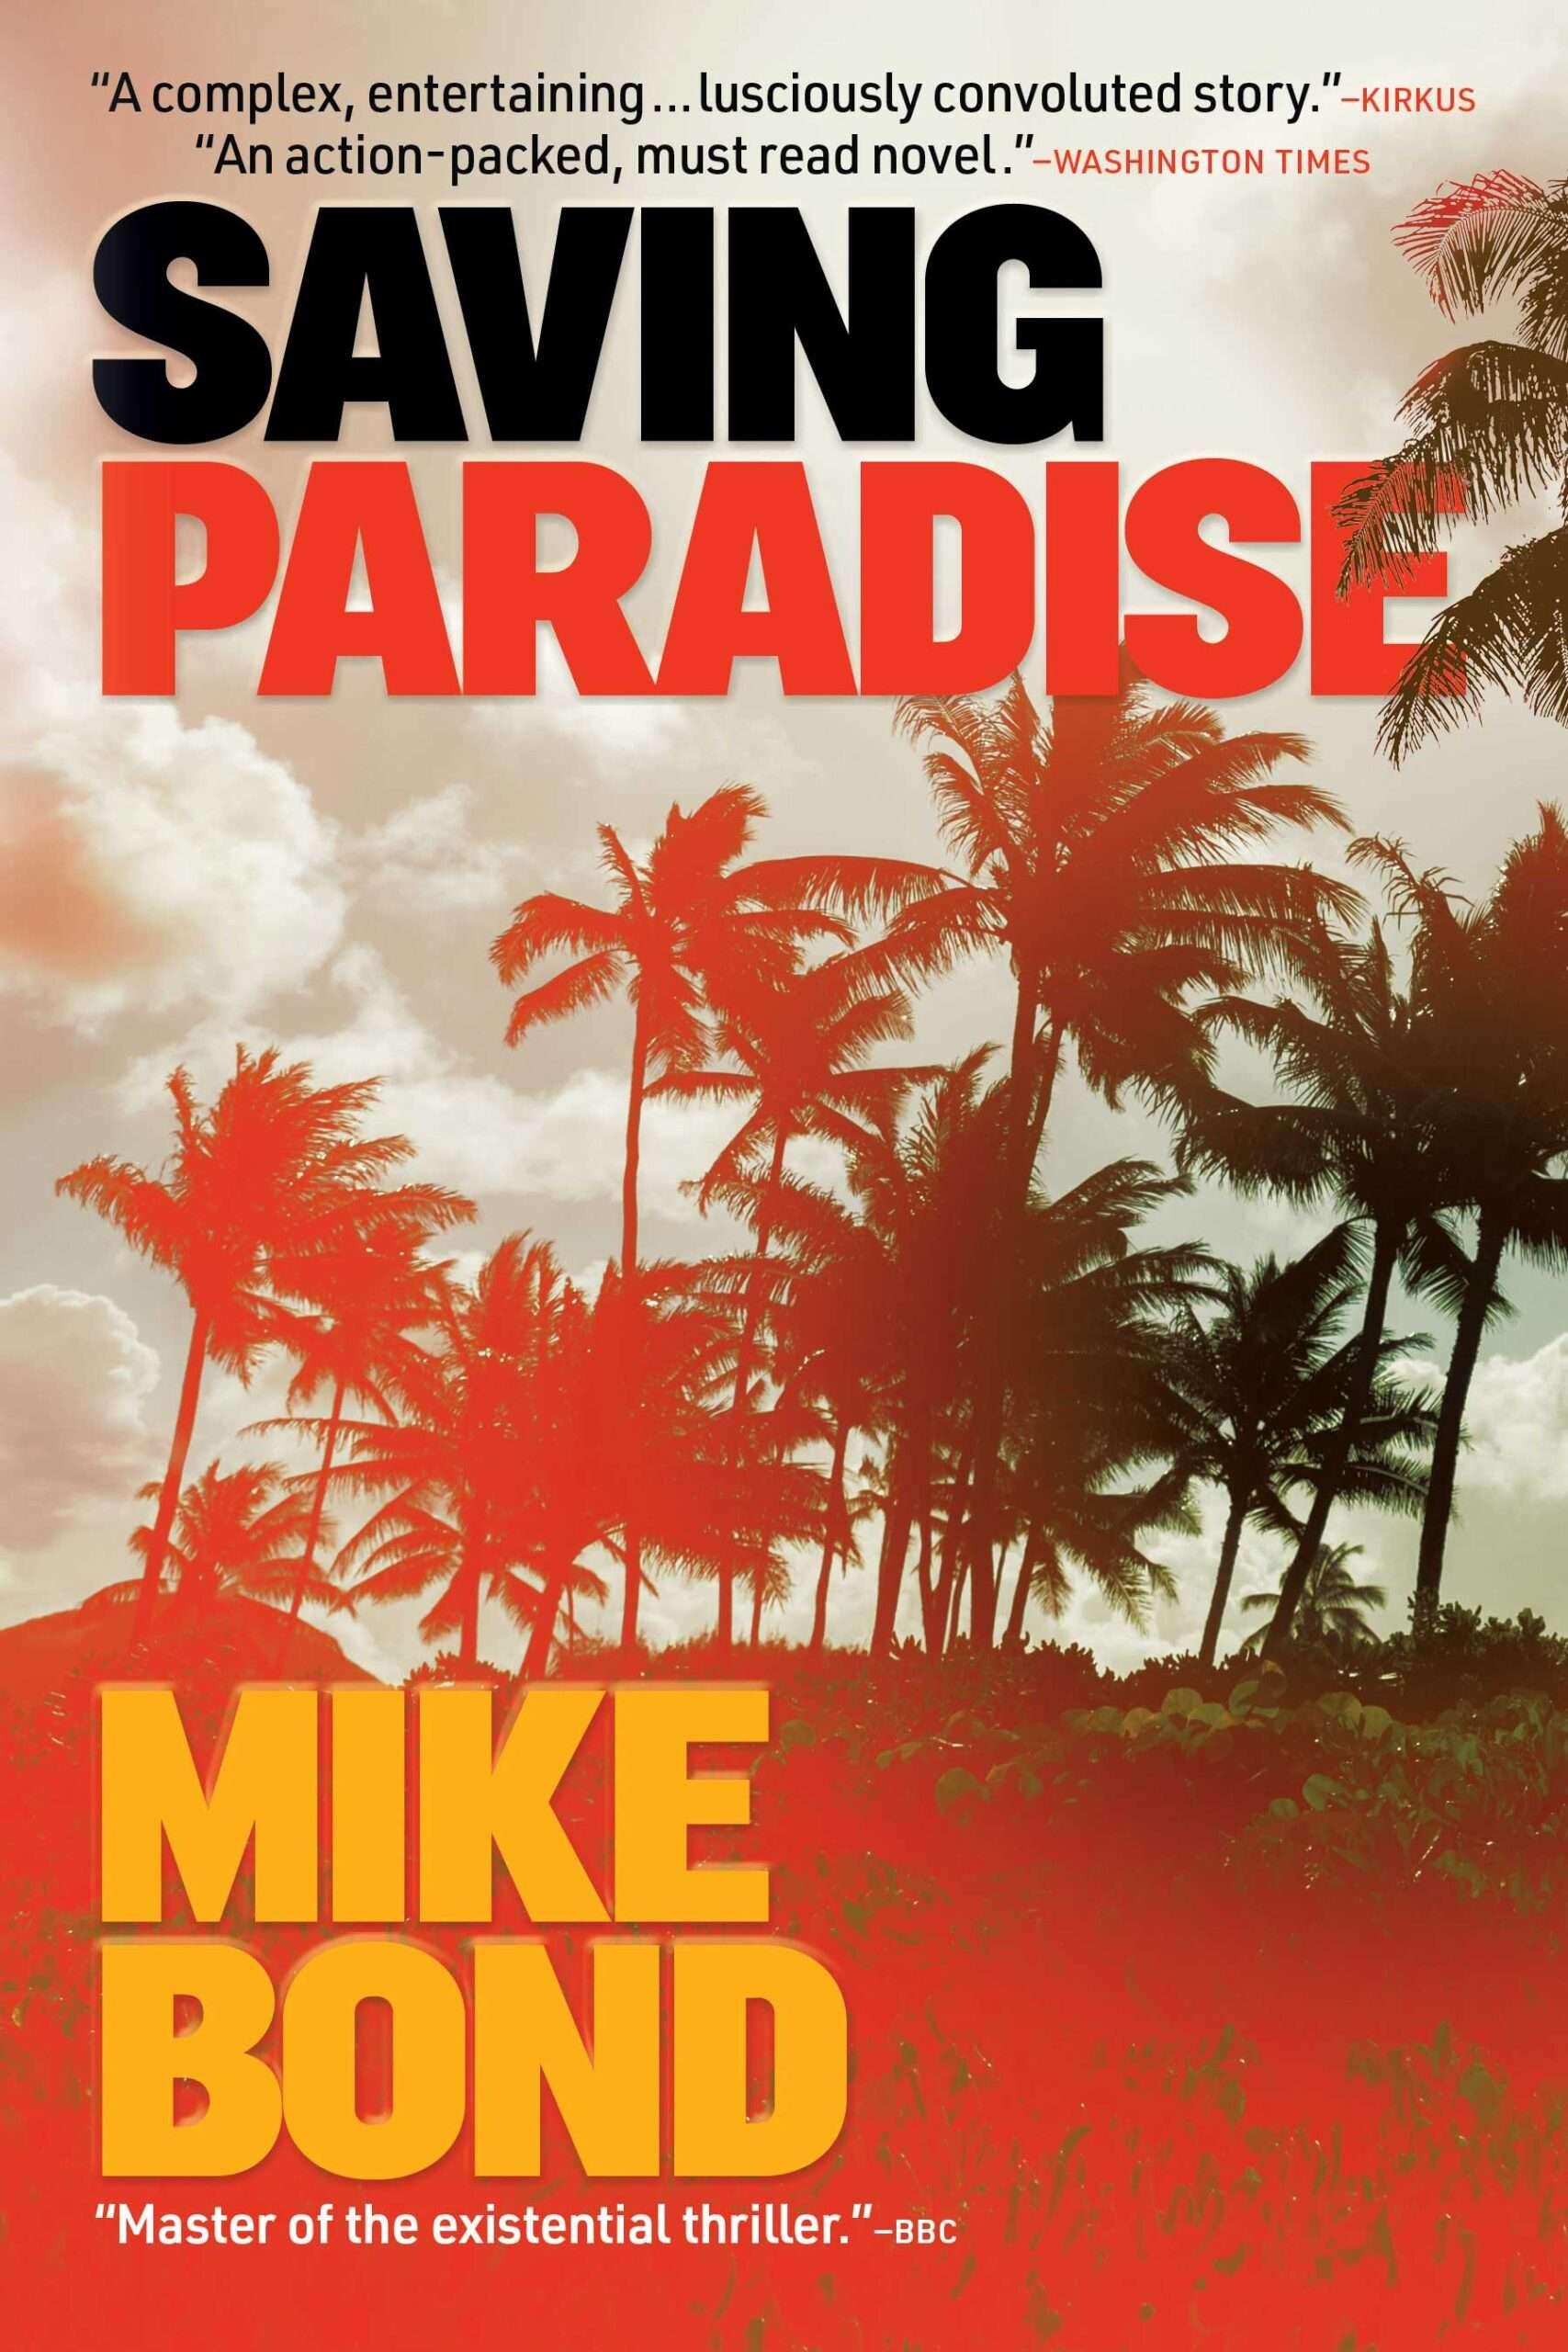 Saving Paradise - Michael Bond Books